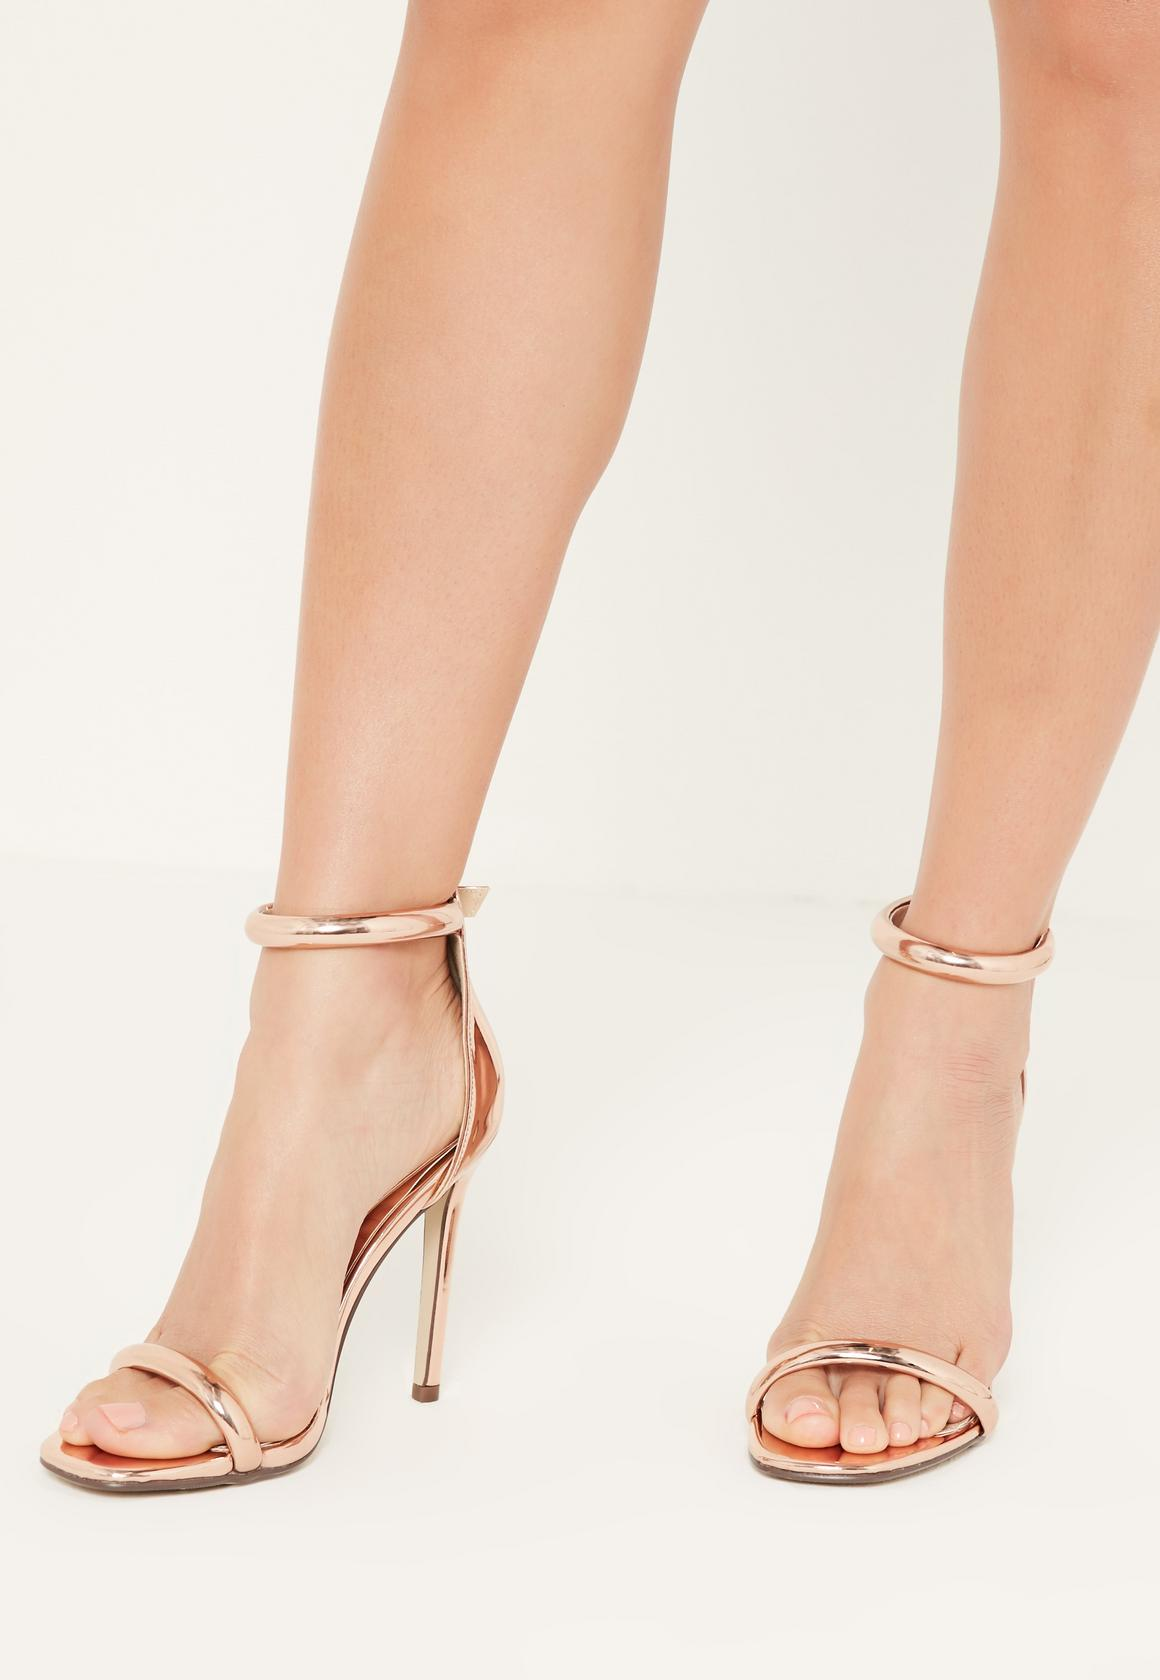 Rose Gold Sandals | Crafty Sandals